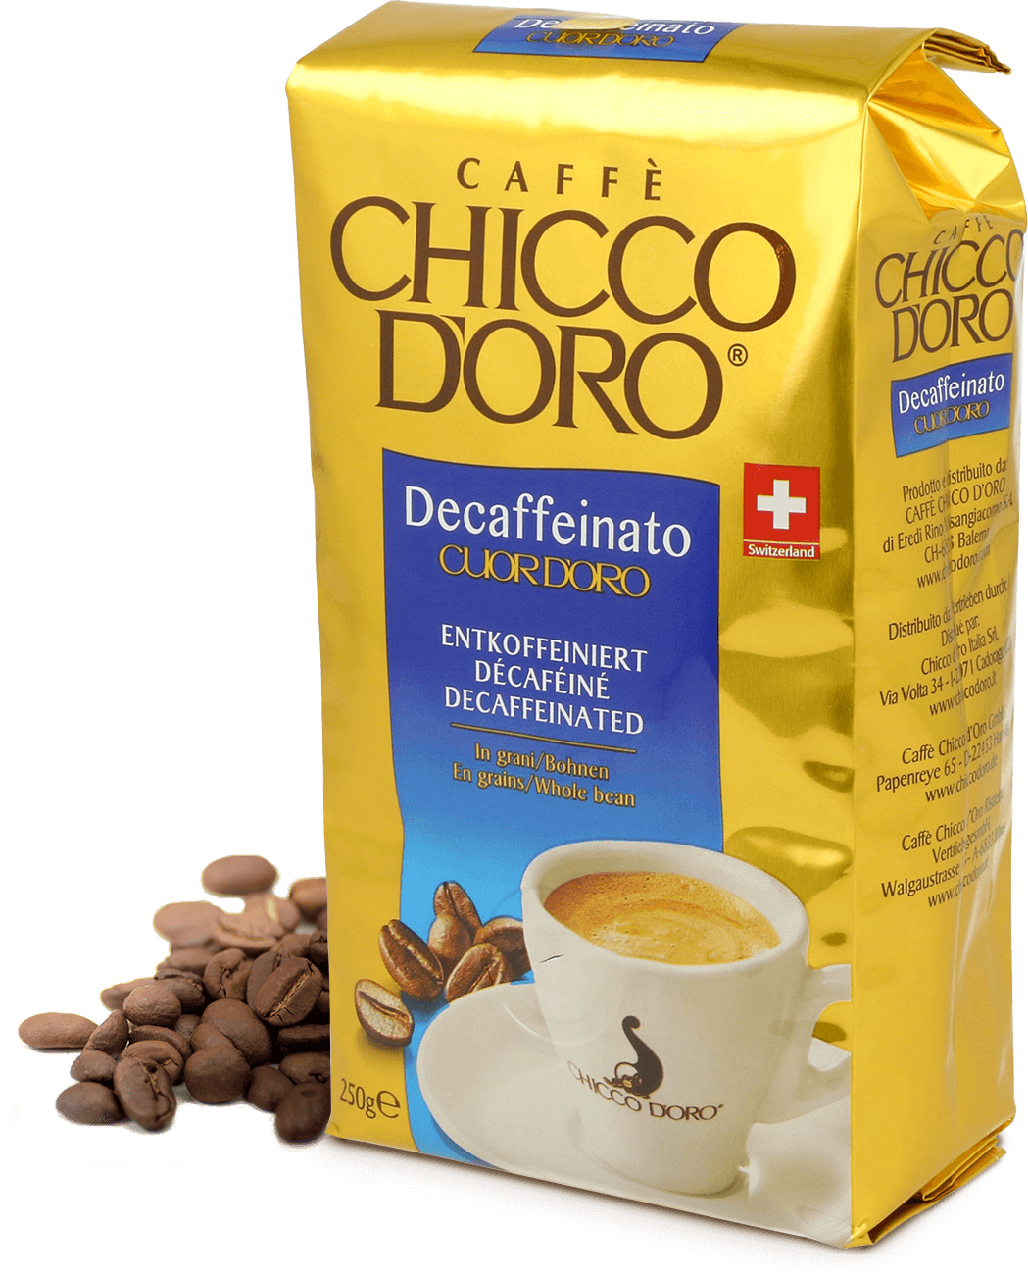 Кофе зерновой Chicco d'oro без кофеина Decaffeinato (100% Арабика) 250г